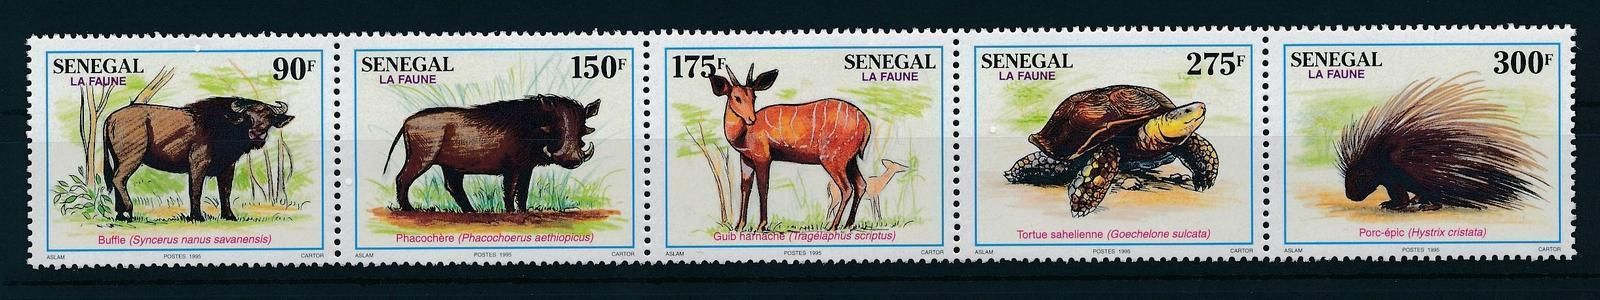 [25799] Senegal 1995 Wild Animals Buffalo Turtle MNH